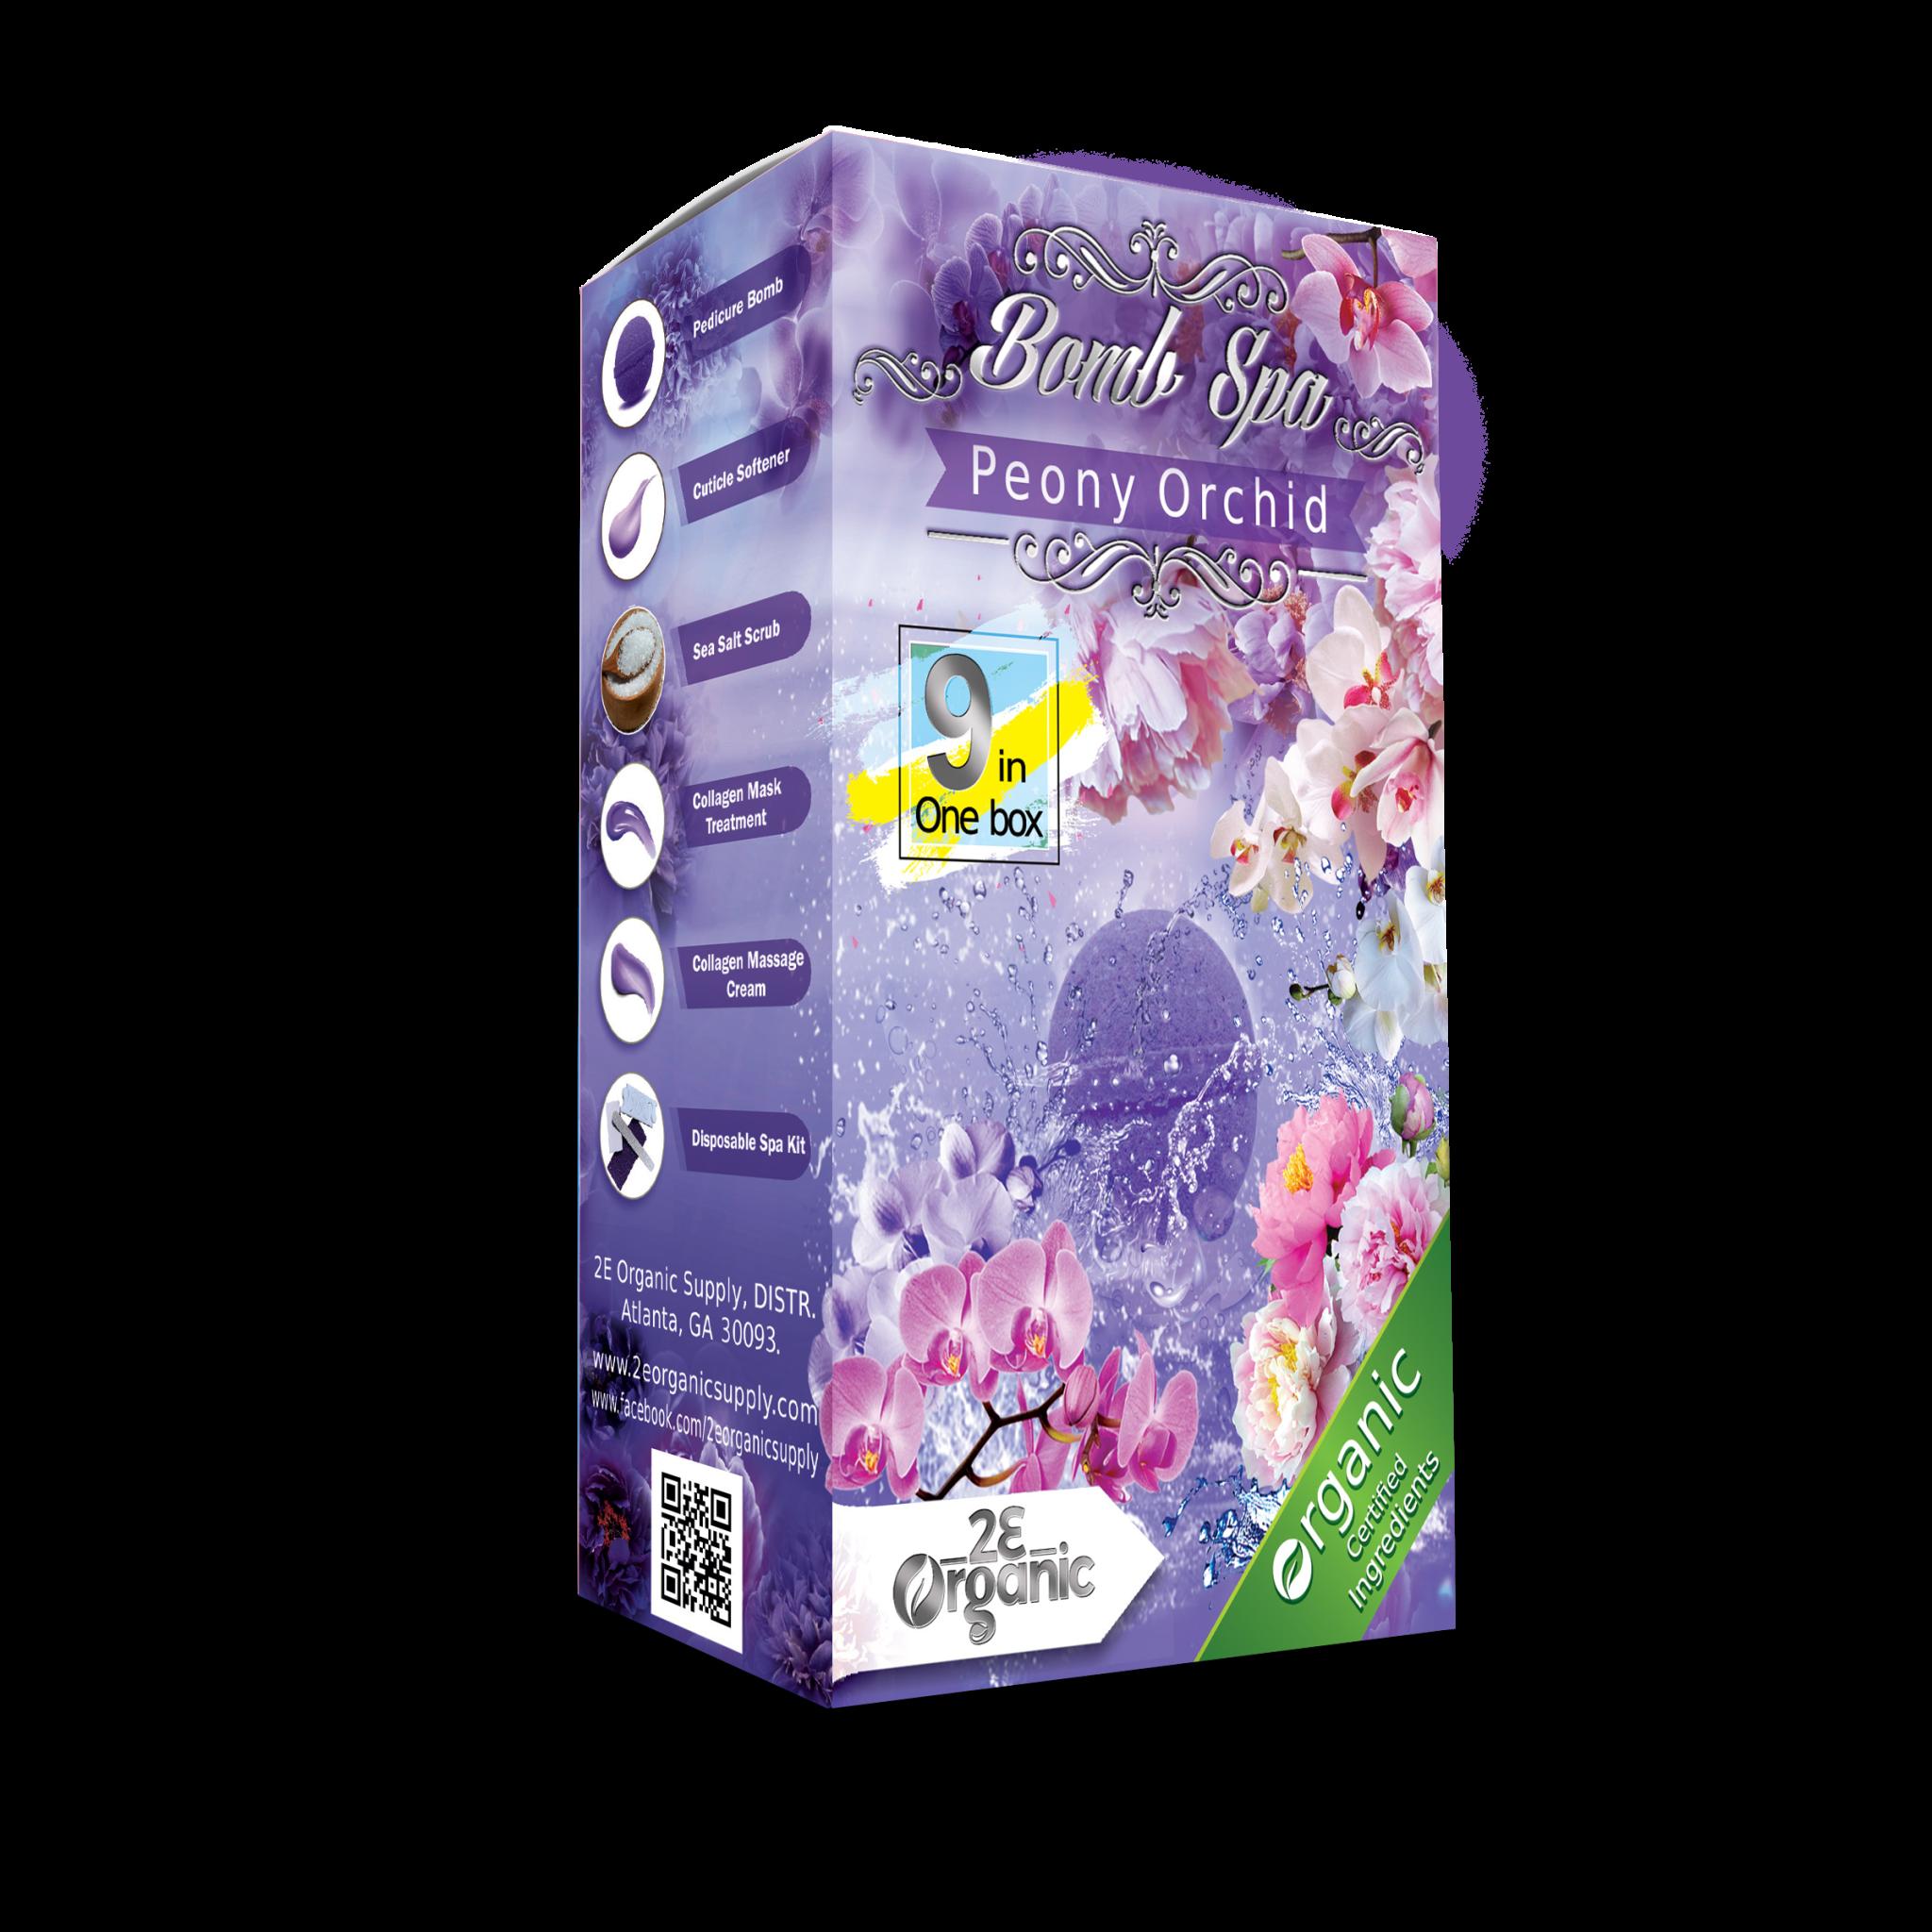 2E Organic 9 in 1 Bomb Spa Peony Orchid Single